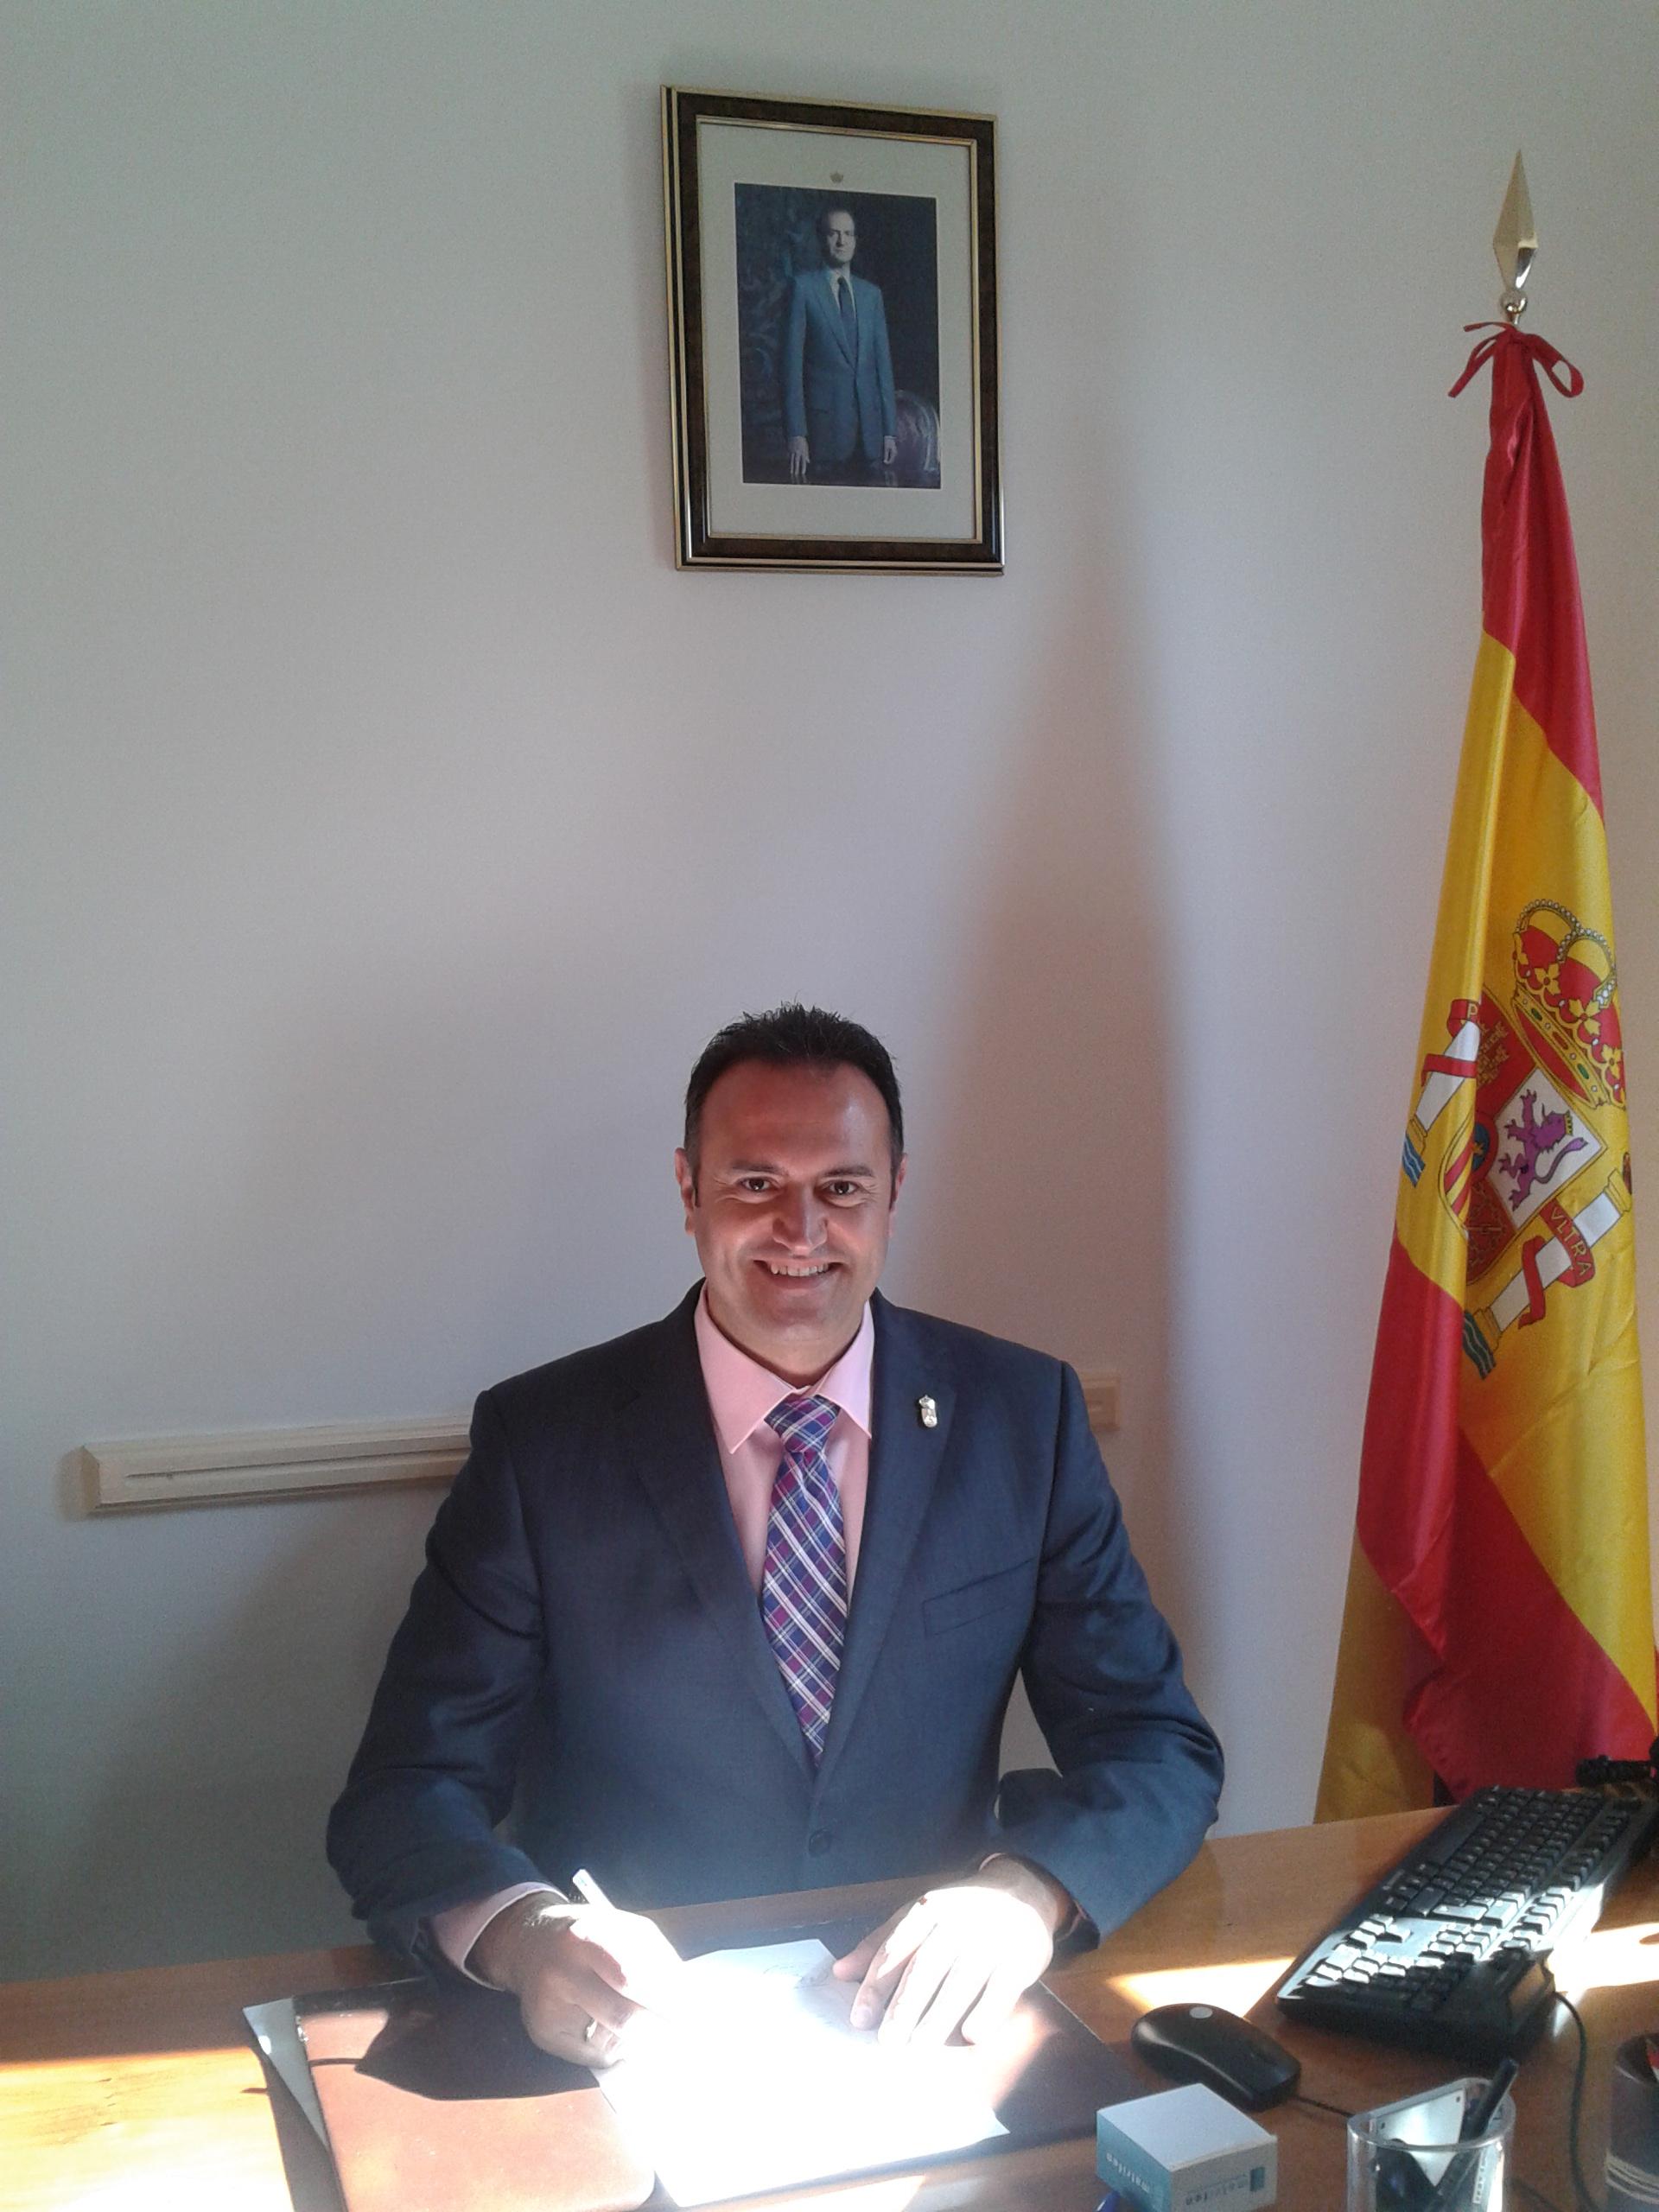 BALDOMERO MARTINEZ CARRETERO